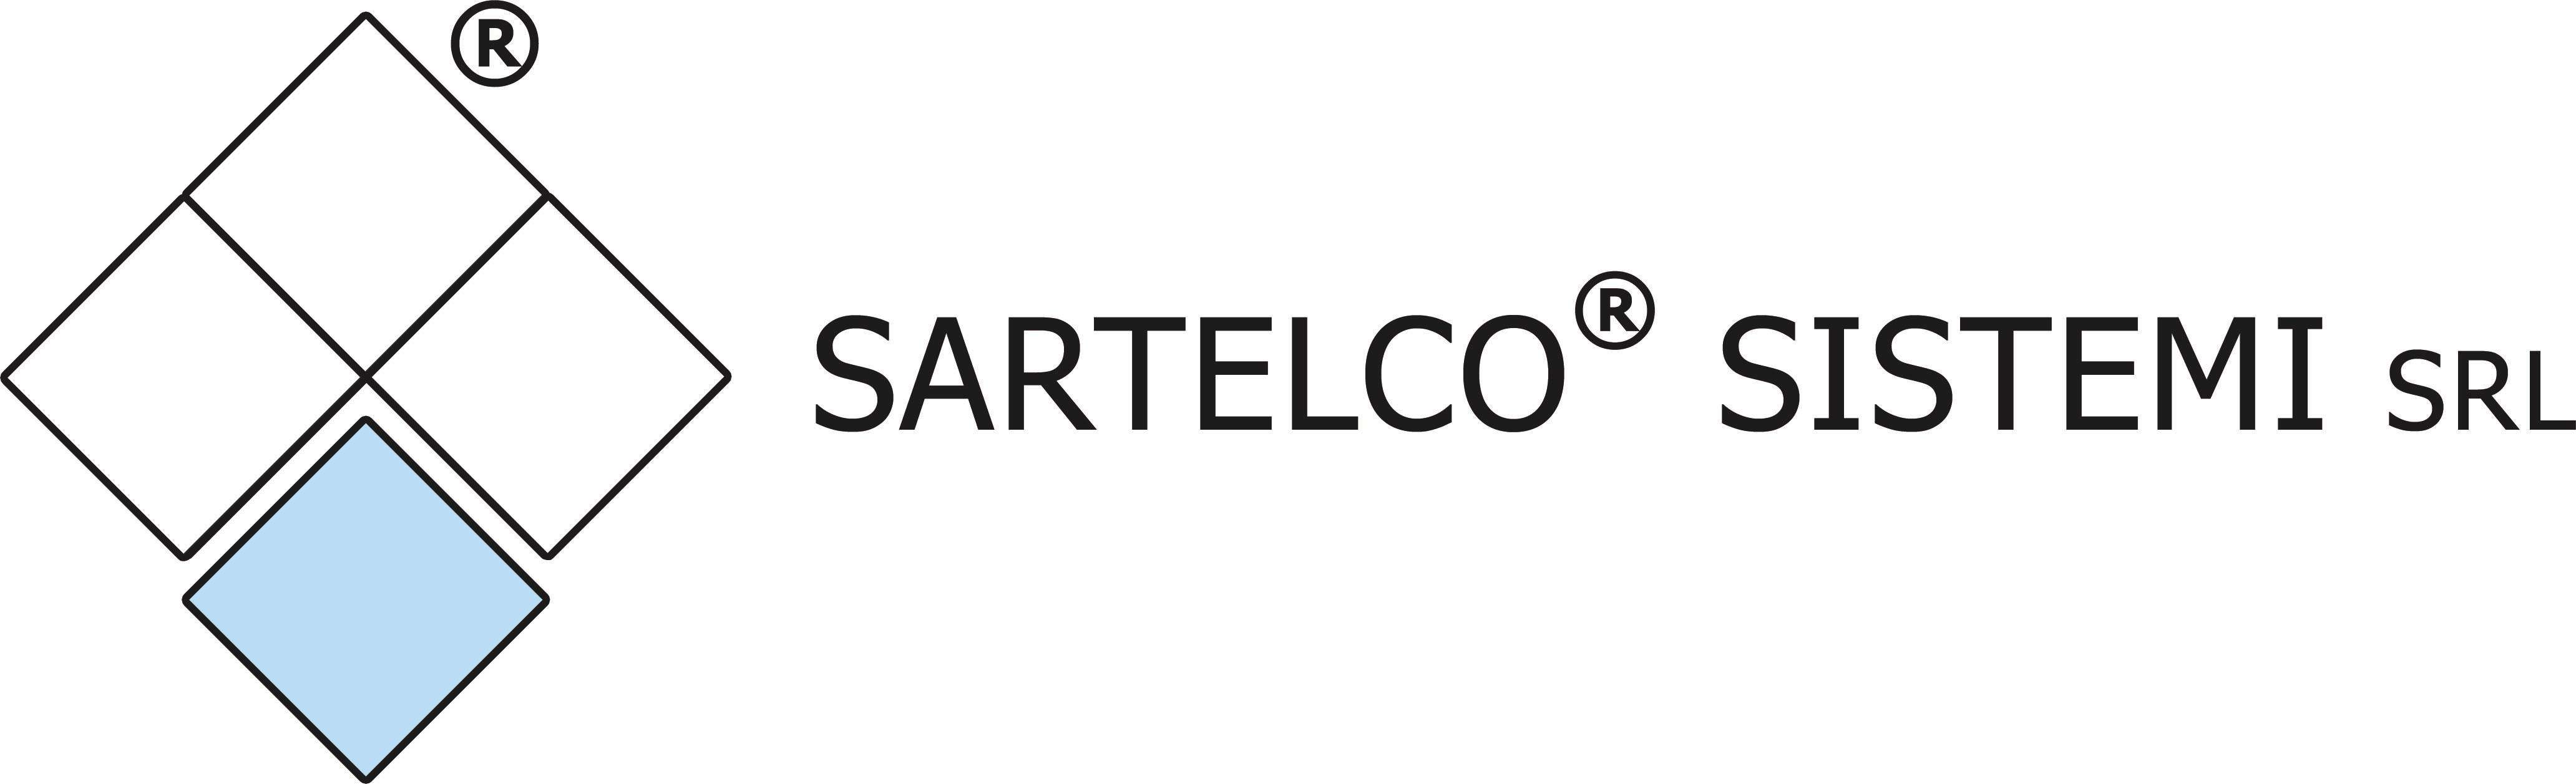 sartelco-sistemi-srl